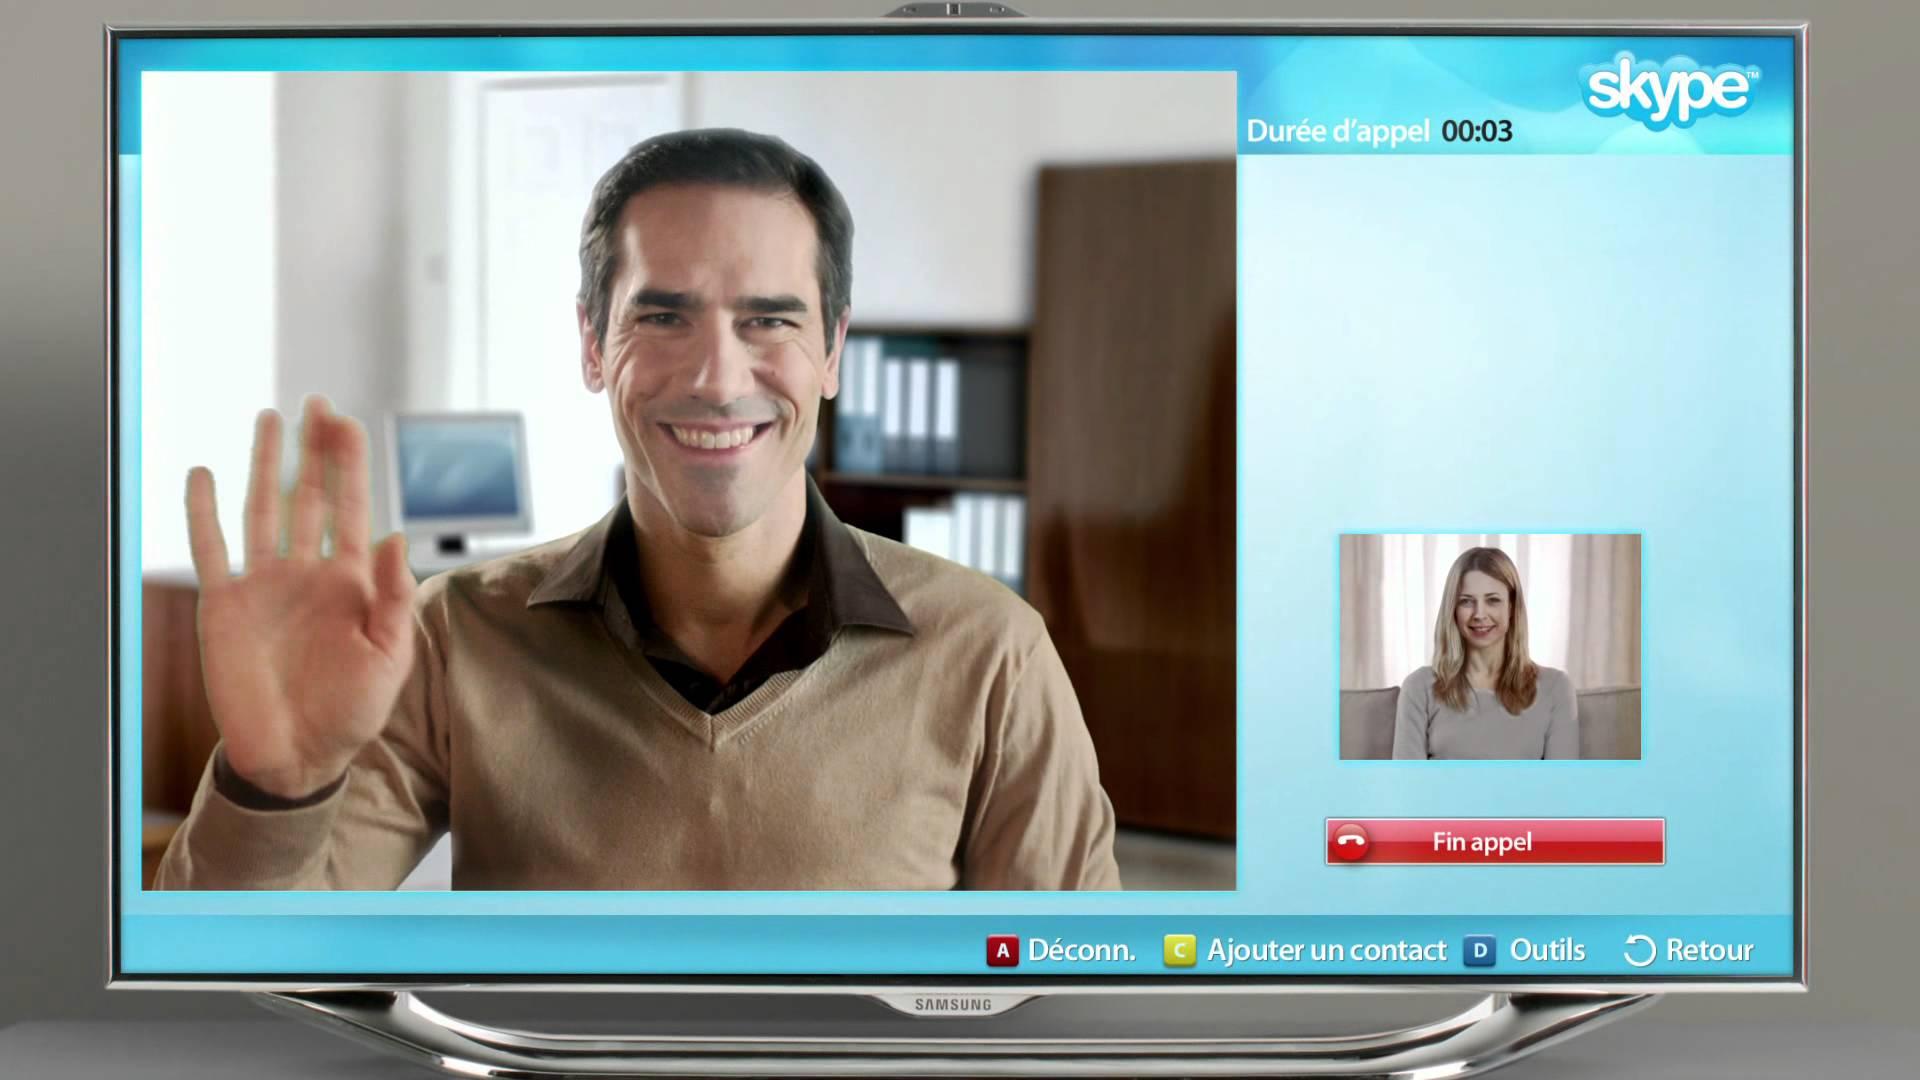 電視視頻傾長途 | Skype for TV 無得玩